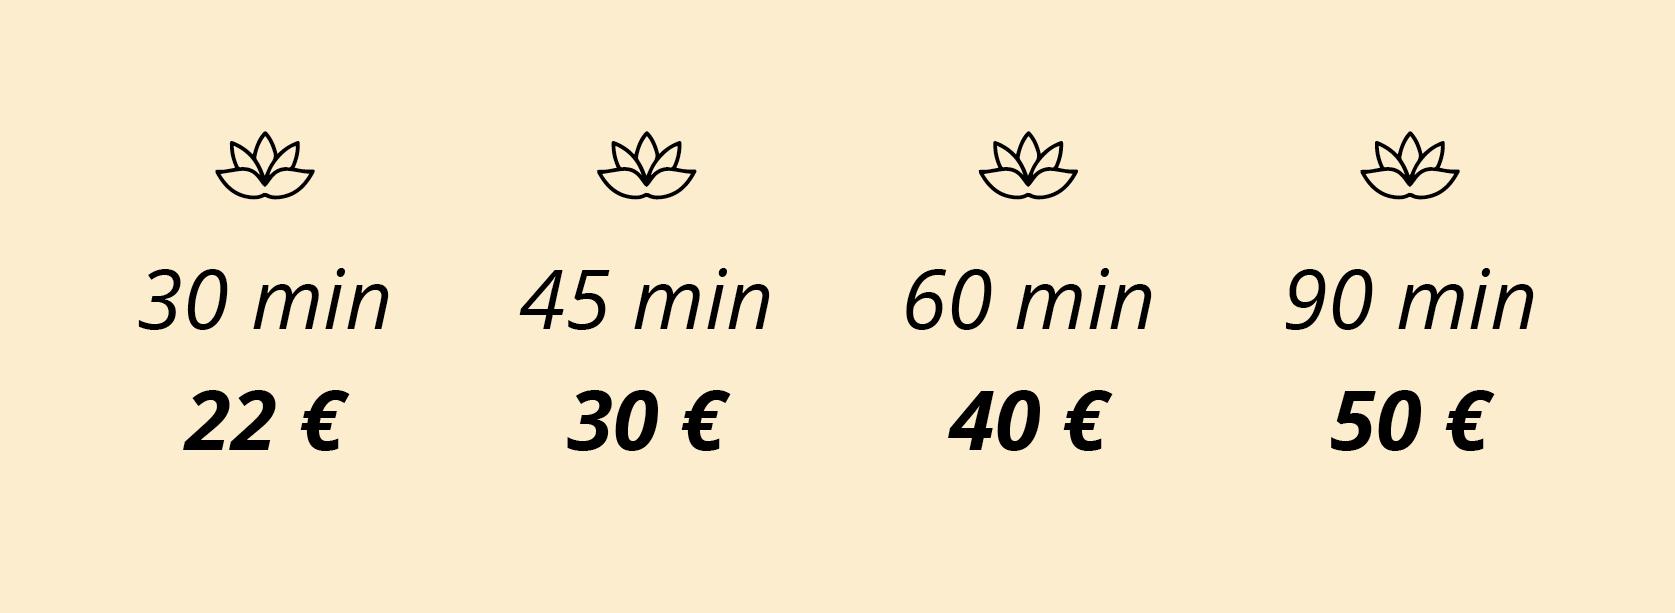 nebo essential oils price